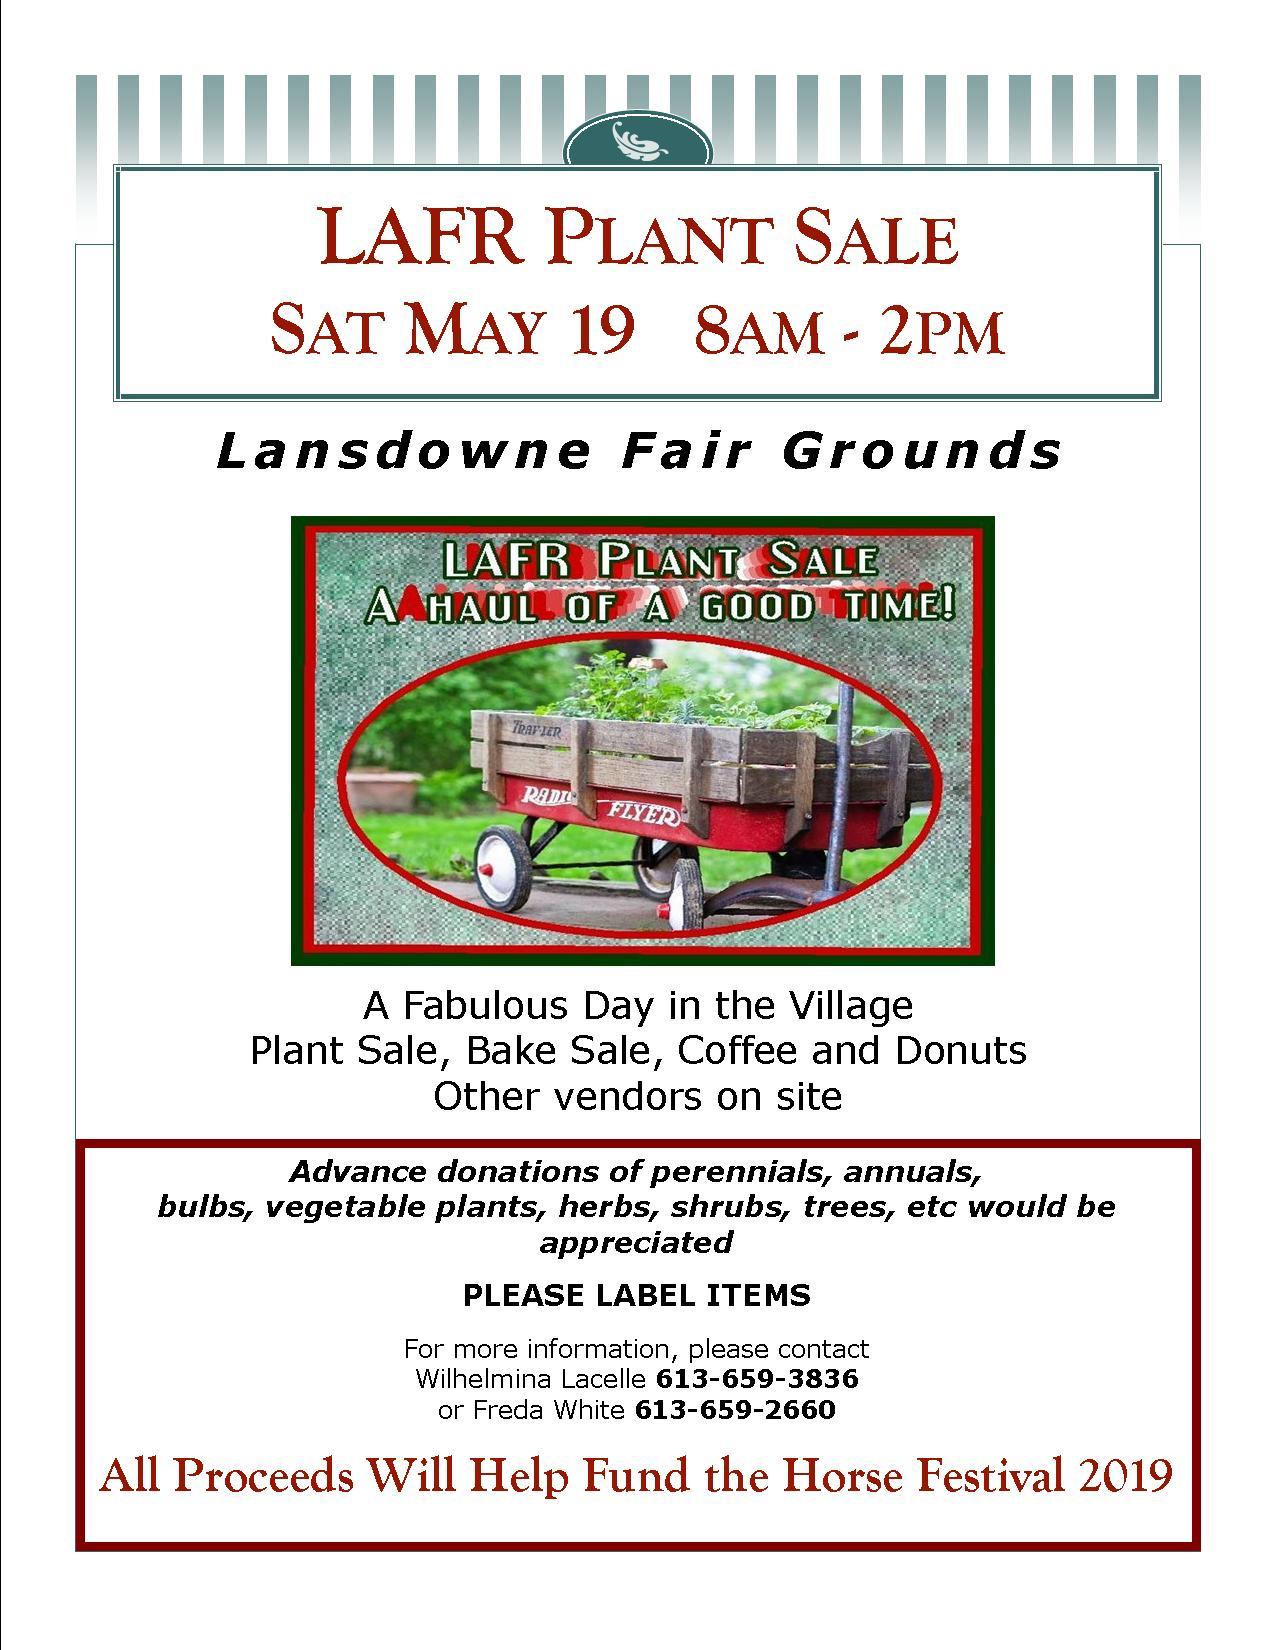 LAFR Annual Plant Sale